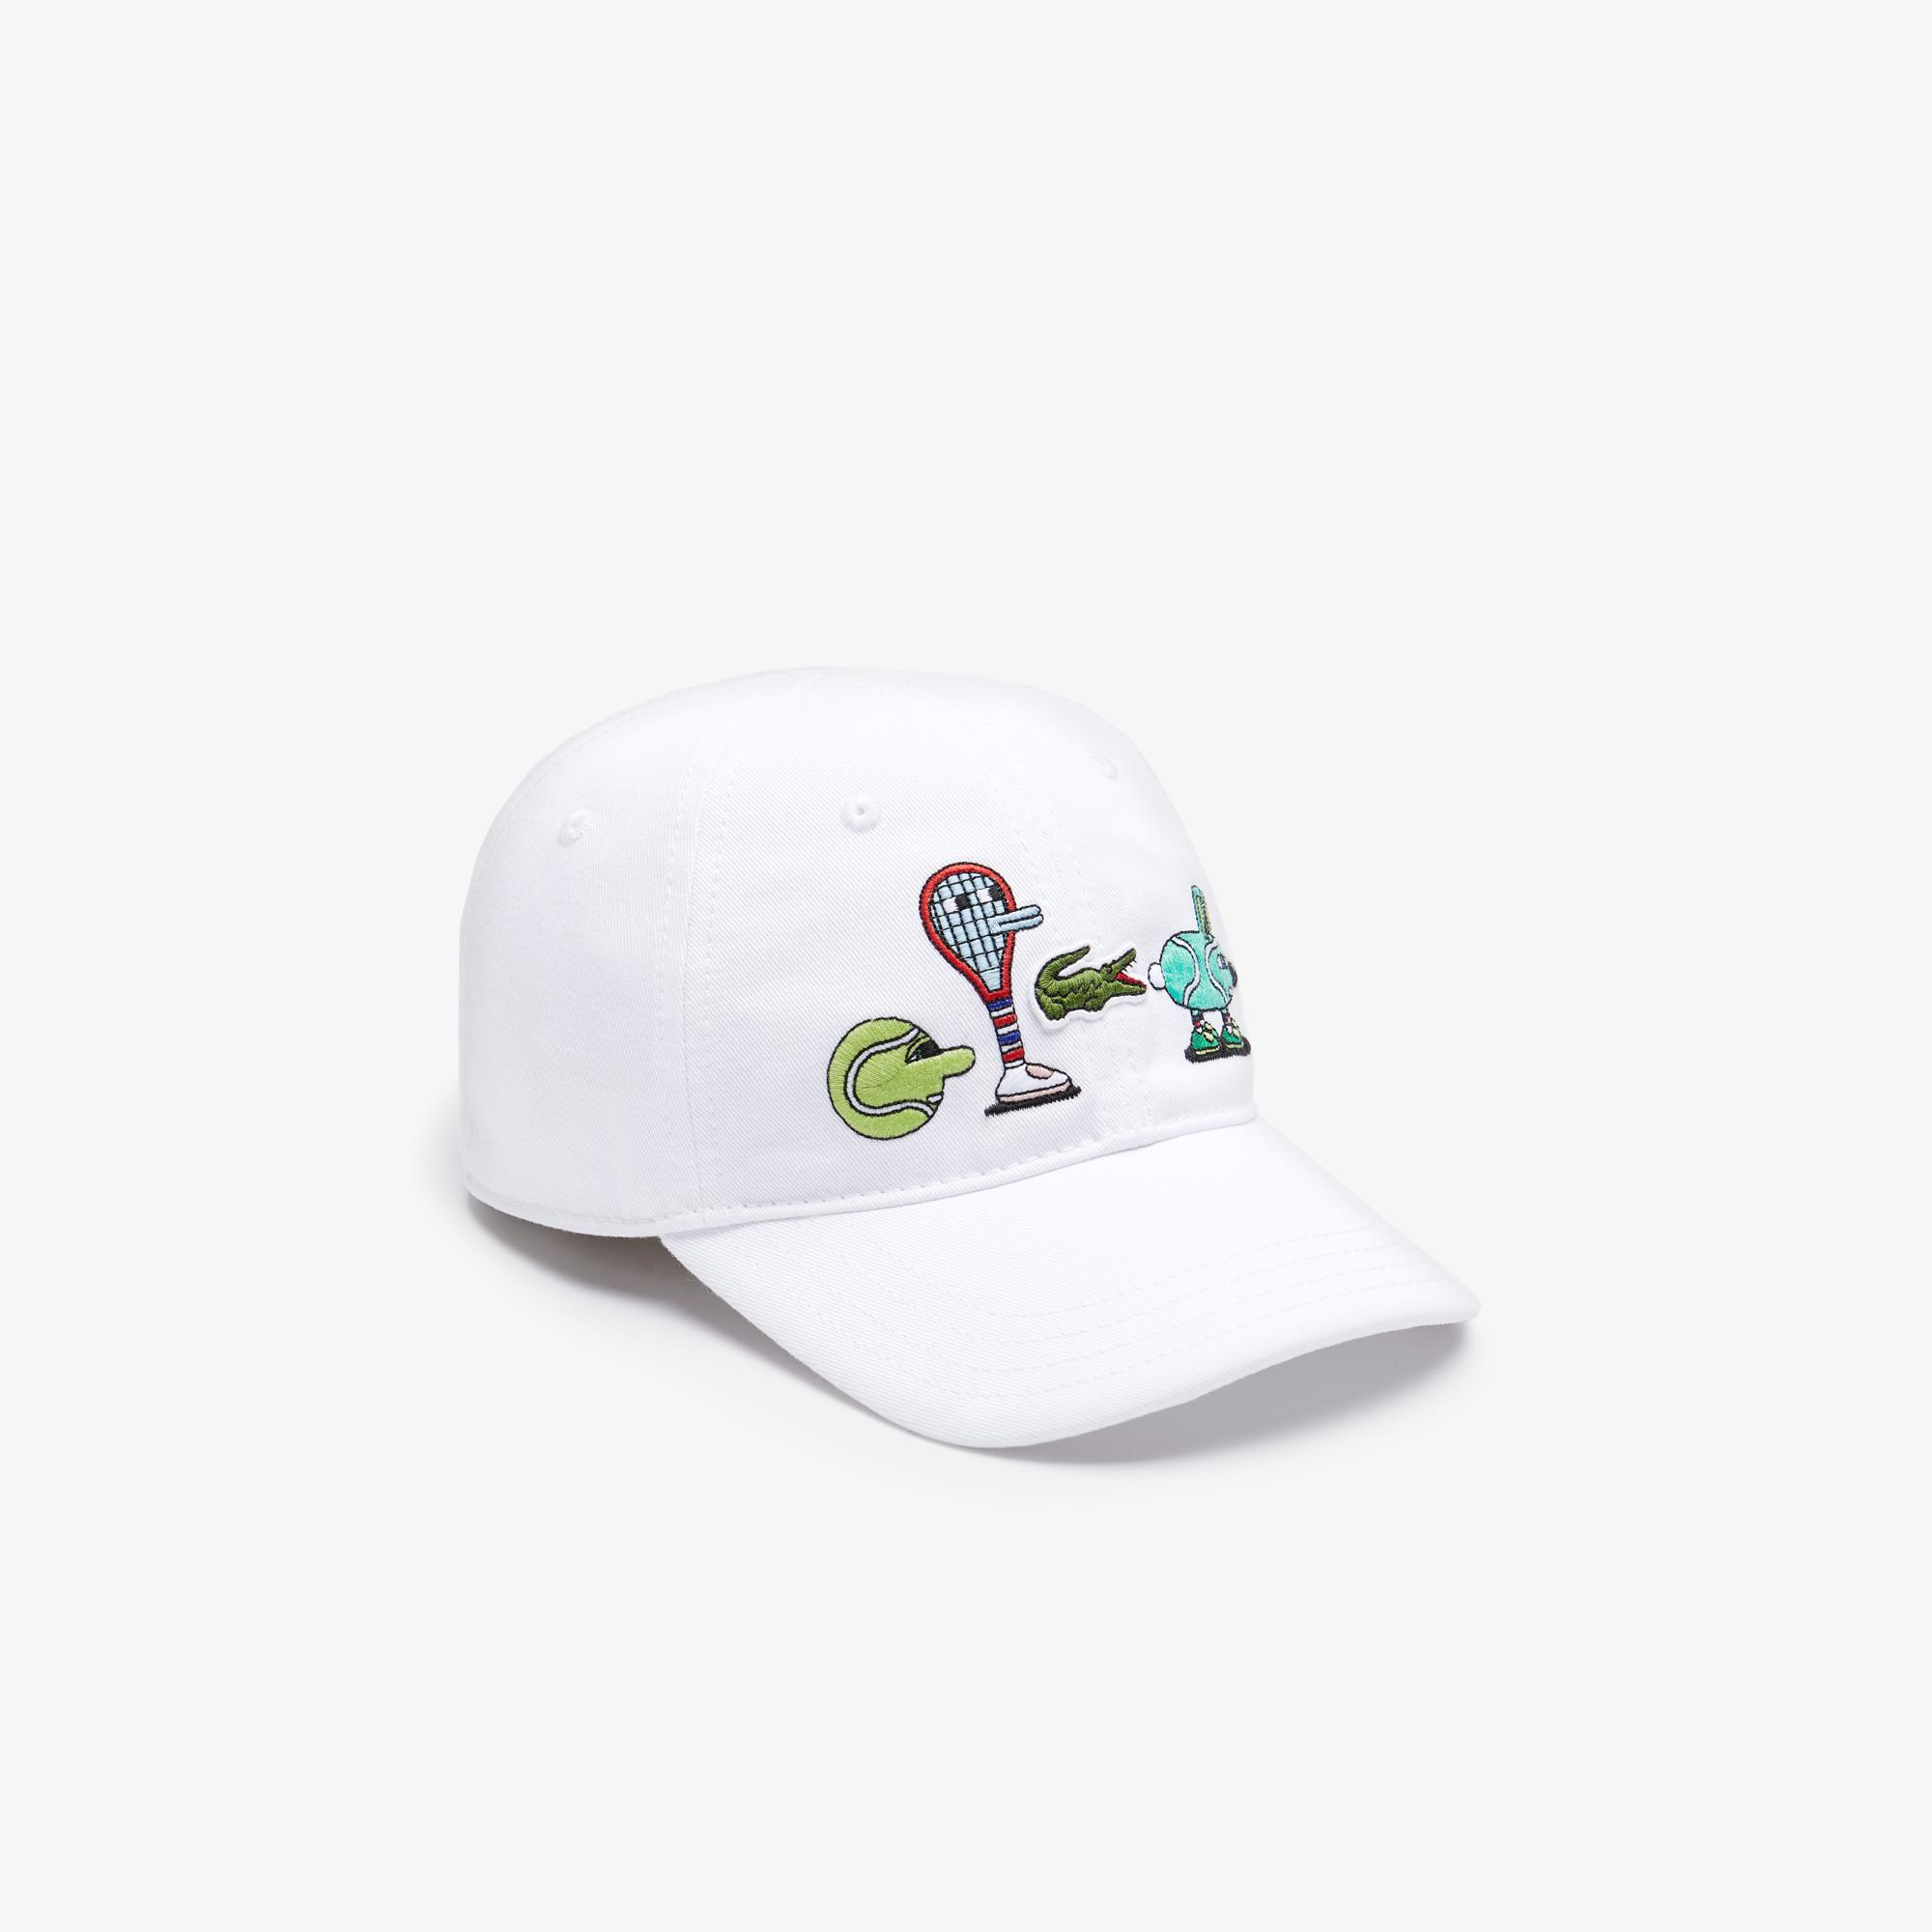 Lacoste X Jeremyville Çocuk Desenli Beyaz Şapka